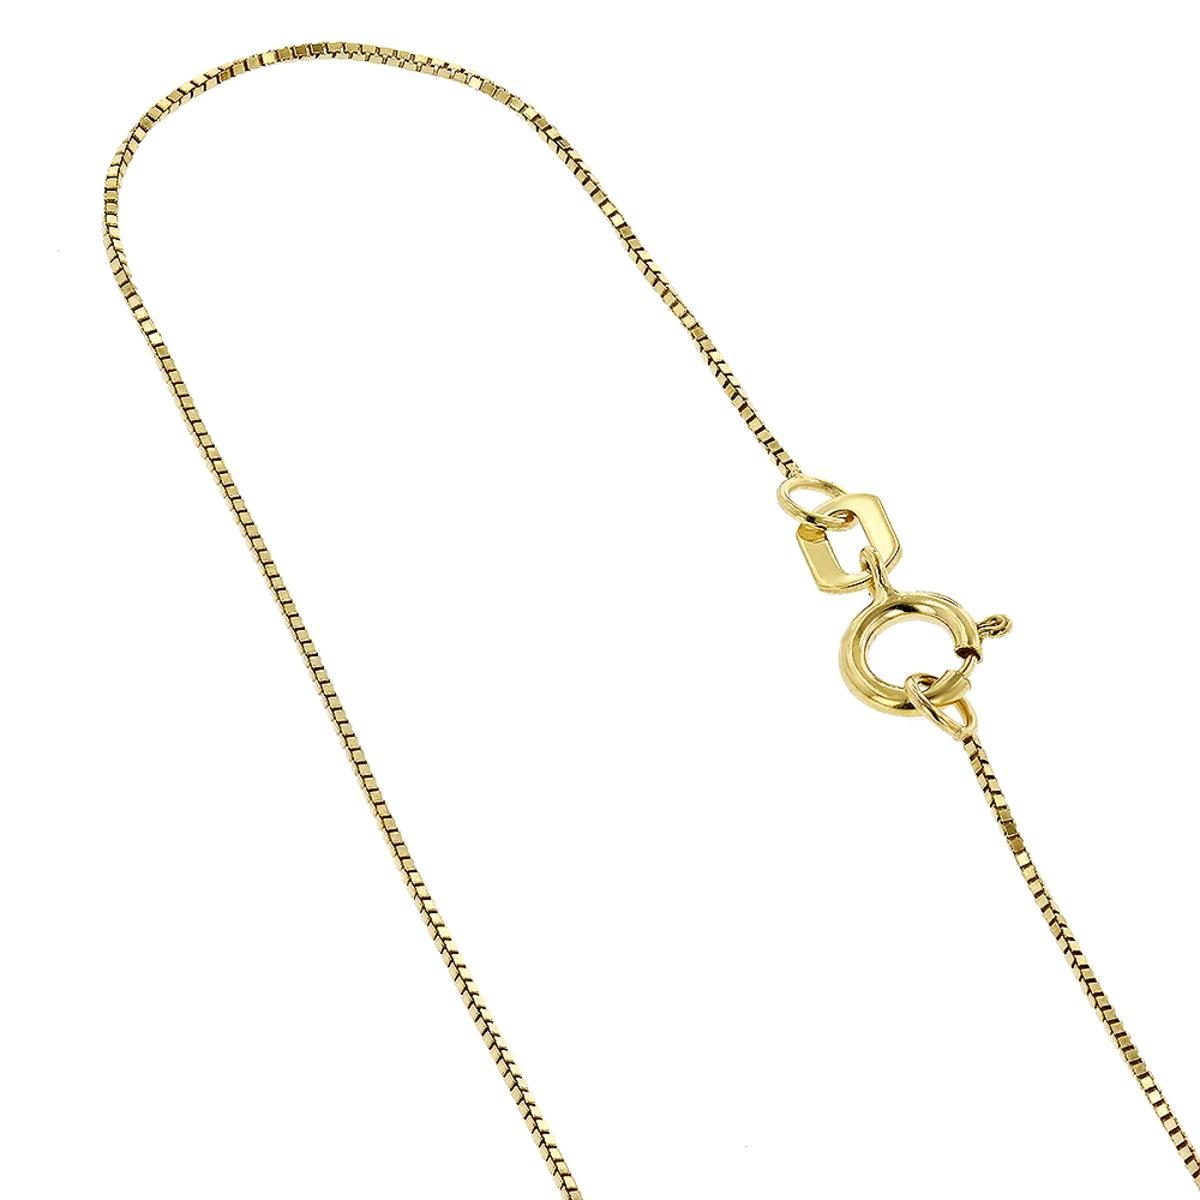 LUXURMAN Solid 10k Gold Box Chain For Women 0.5mm Wide